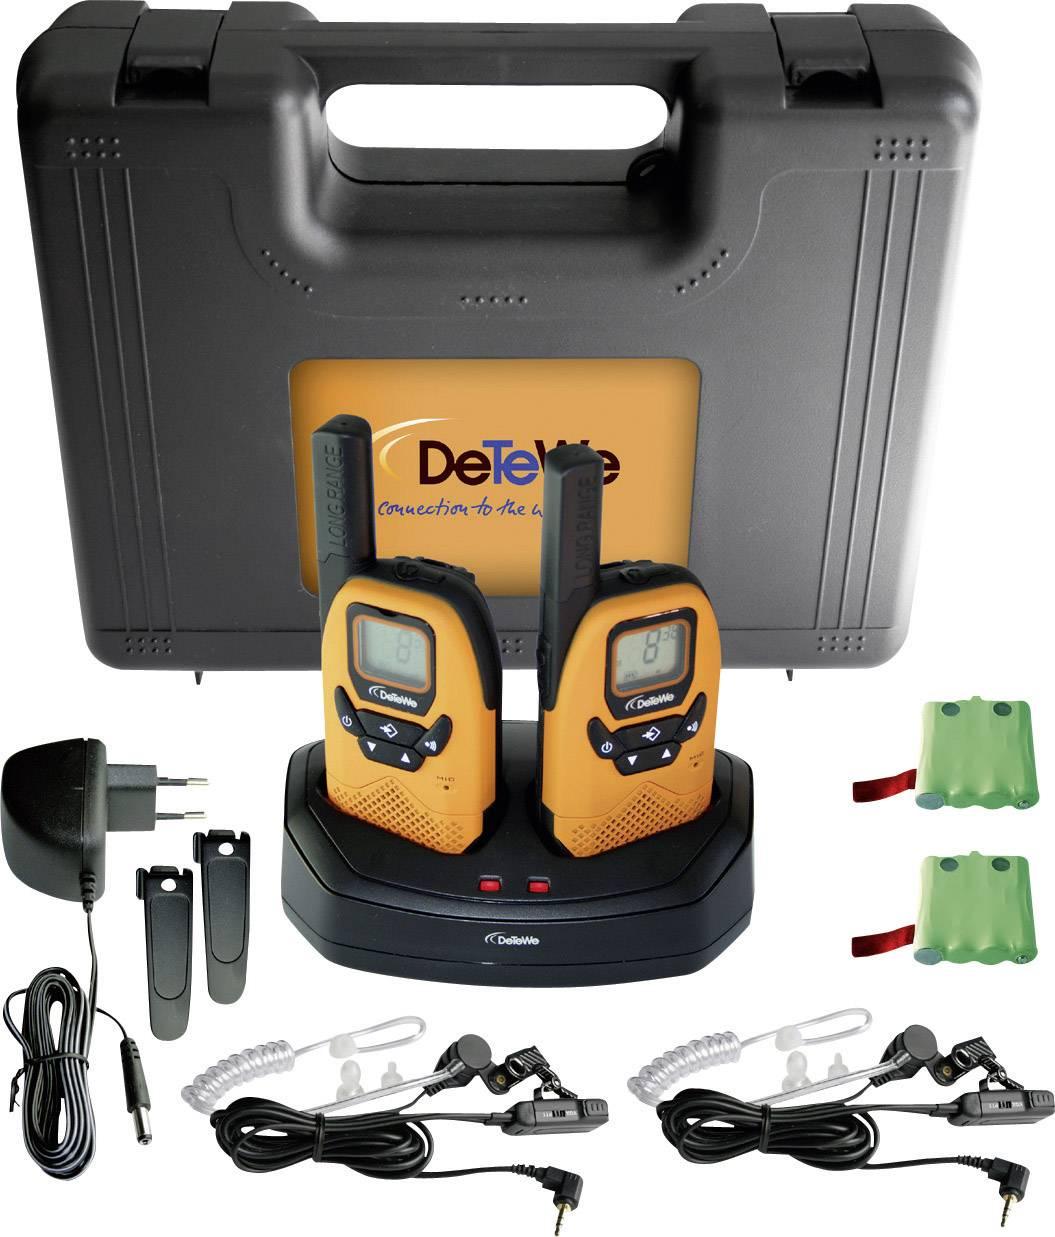 Kufřík s PMR vysílačkami DeTeWe Outdoor 8000 DUO Case, 208046